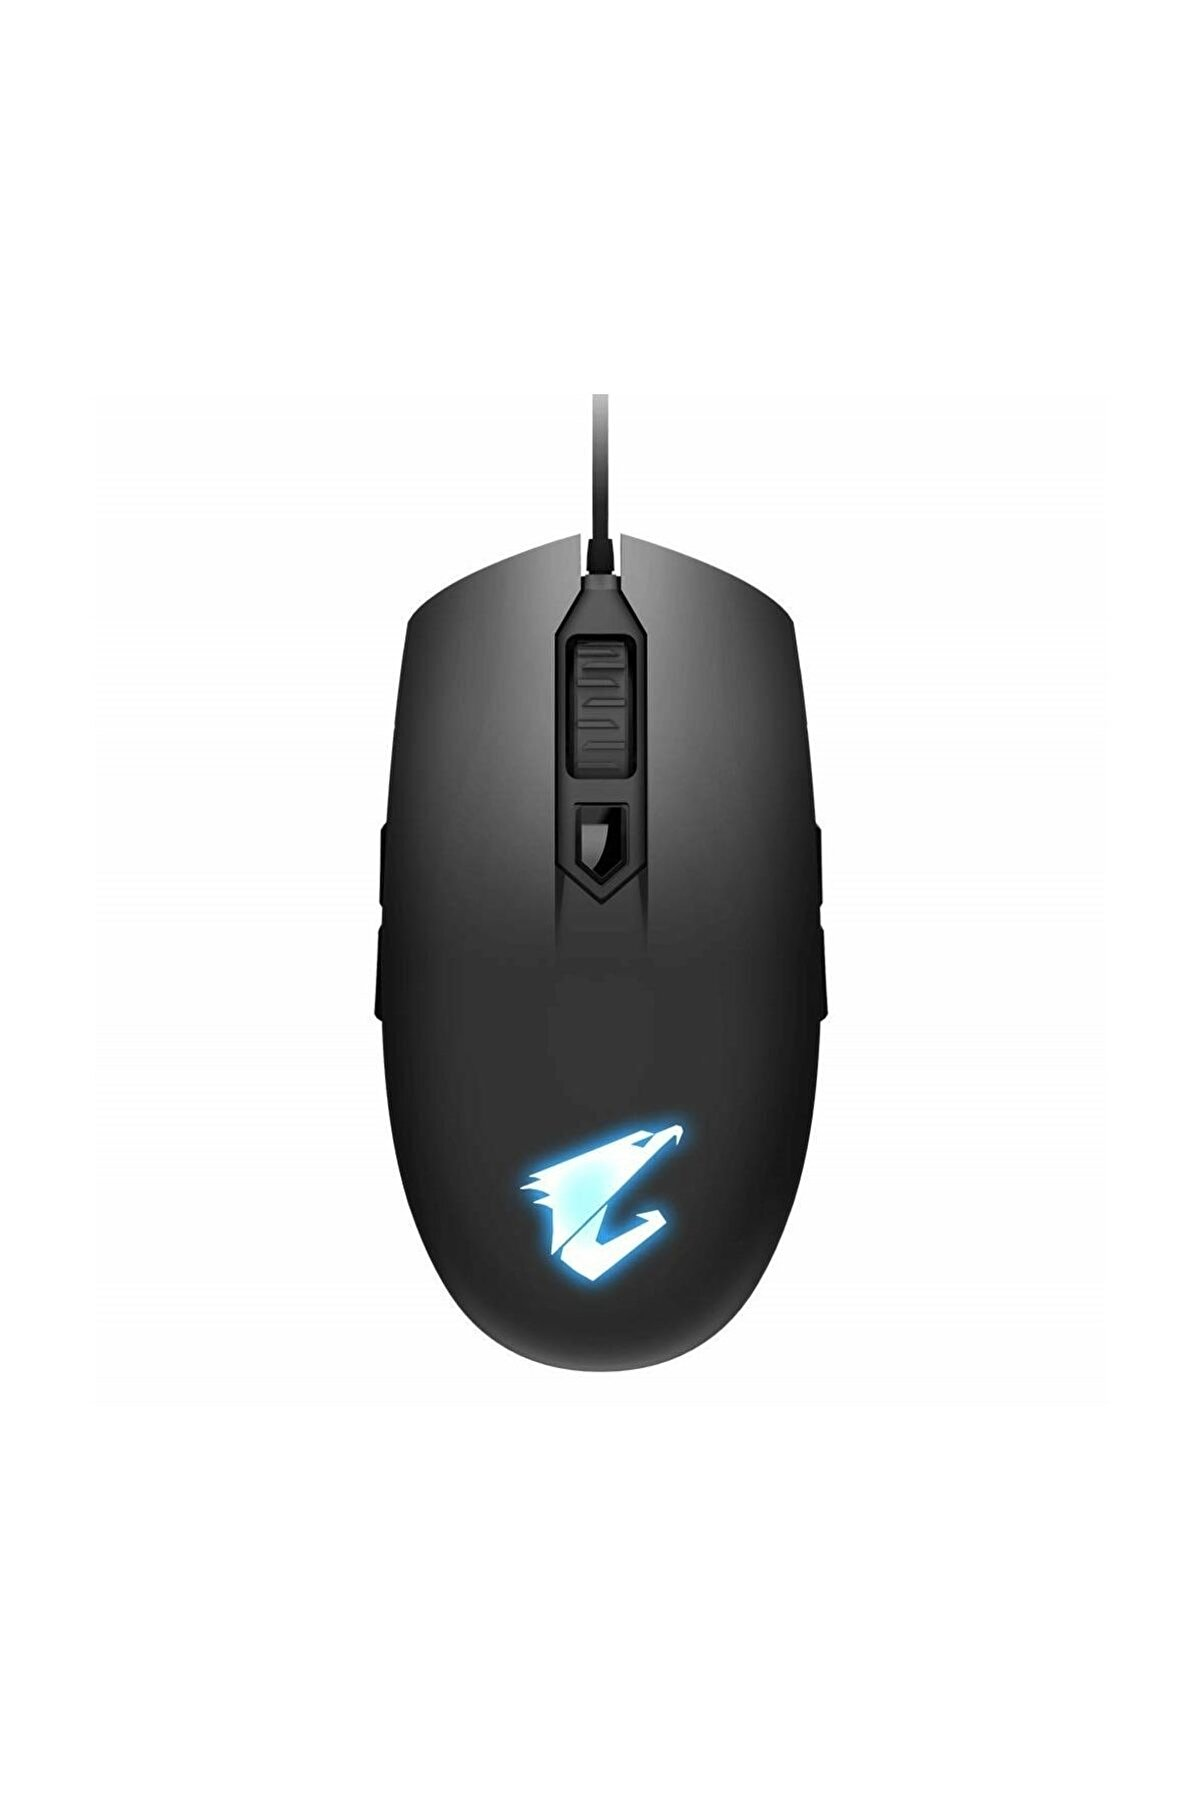 Gigabyte Aorus M2 RGB Gaming Mouse GM-AORUS-M2